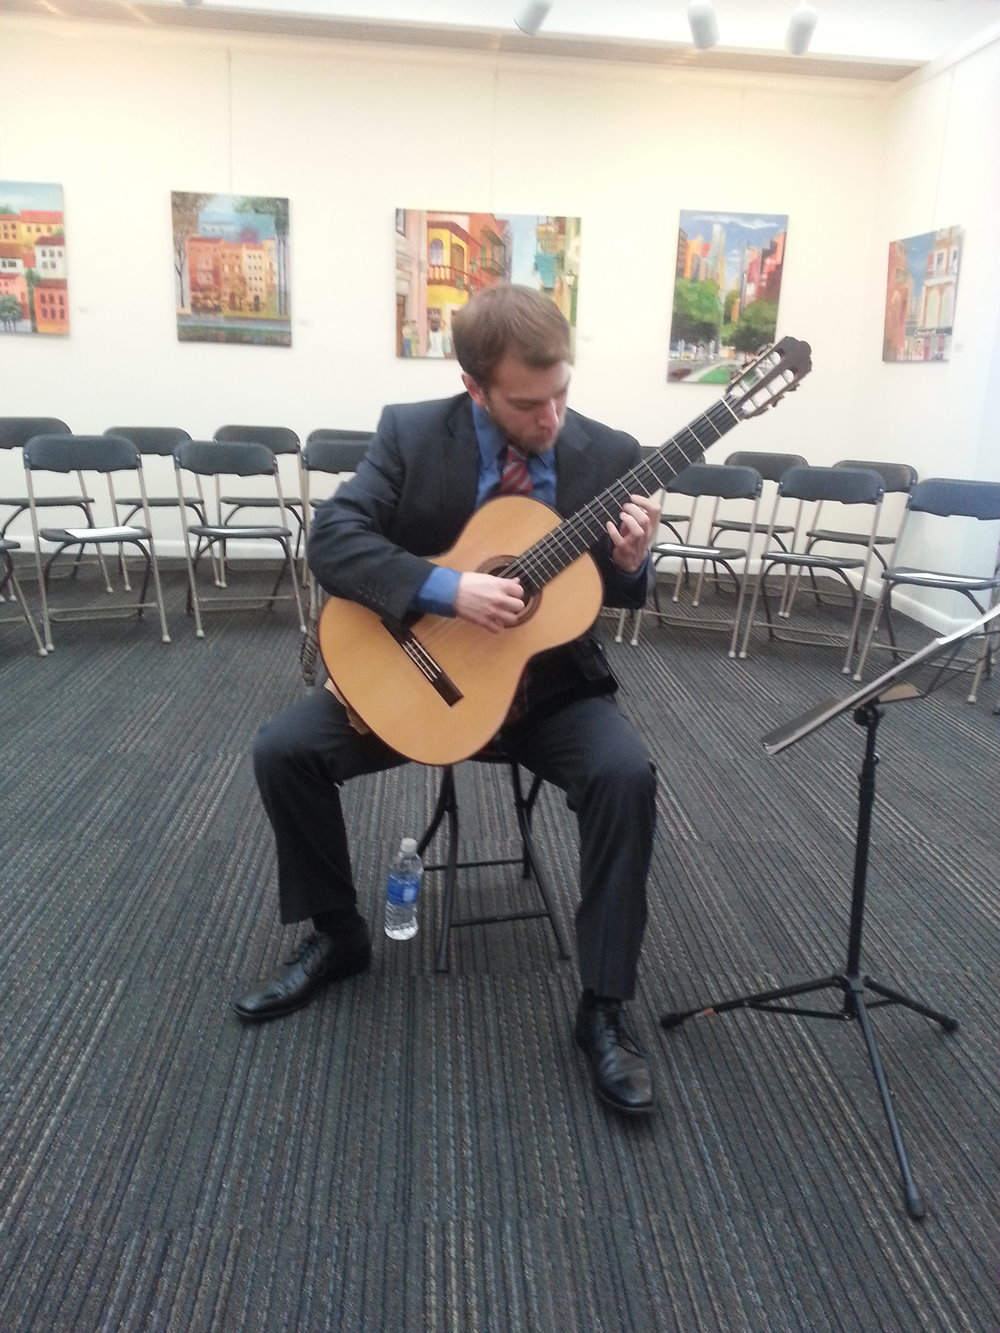 FSU, Benjamin Lougheed, Performing at Florida Capital Building.jpg